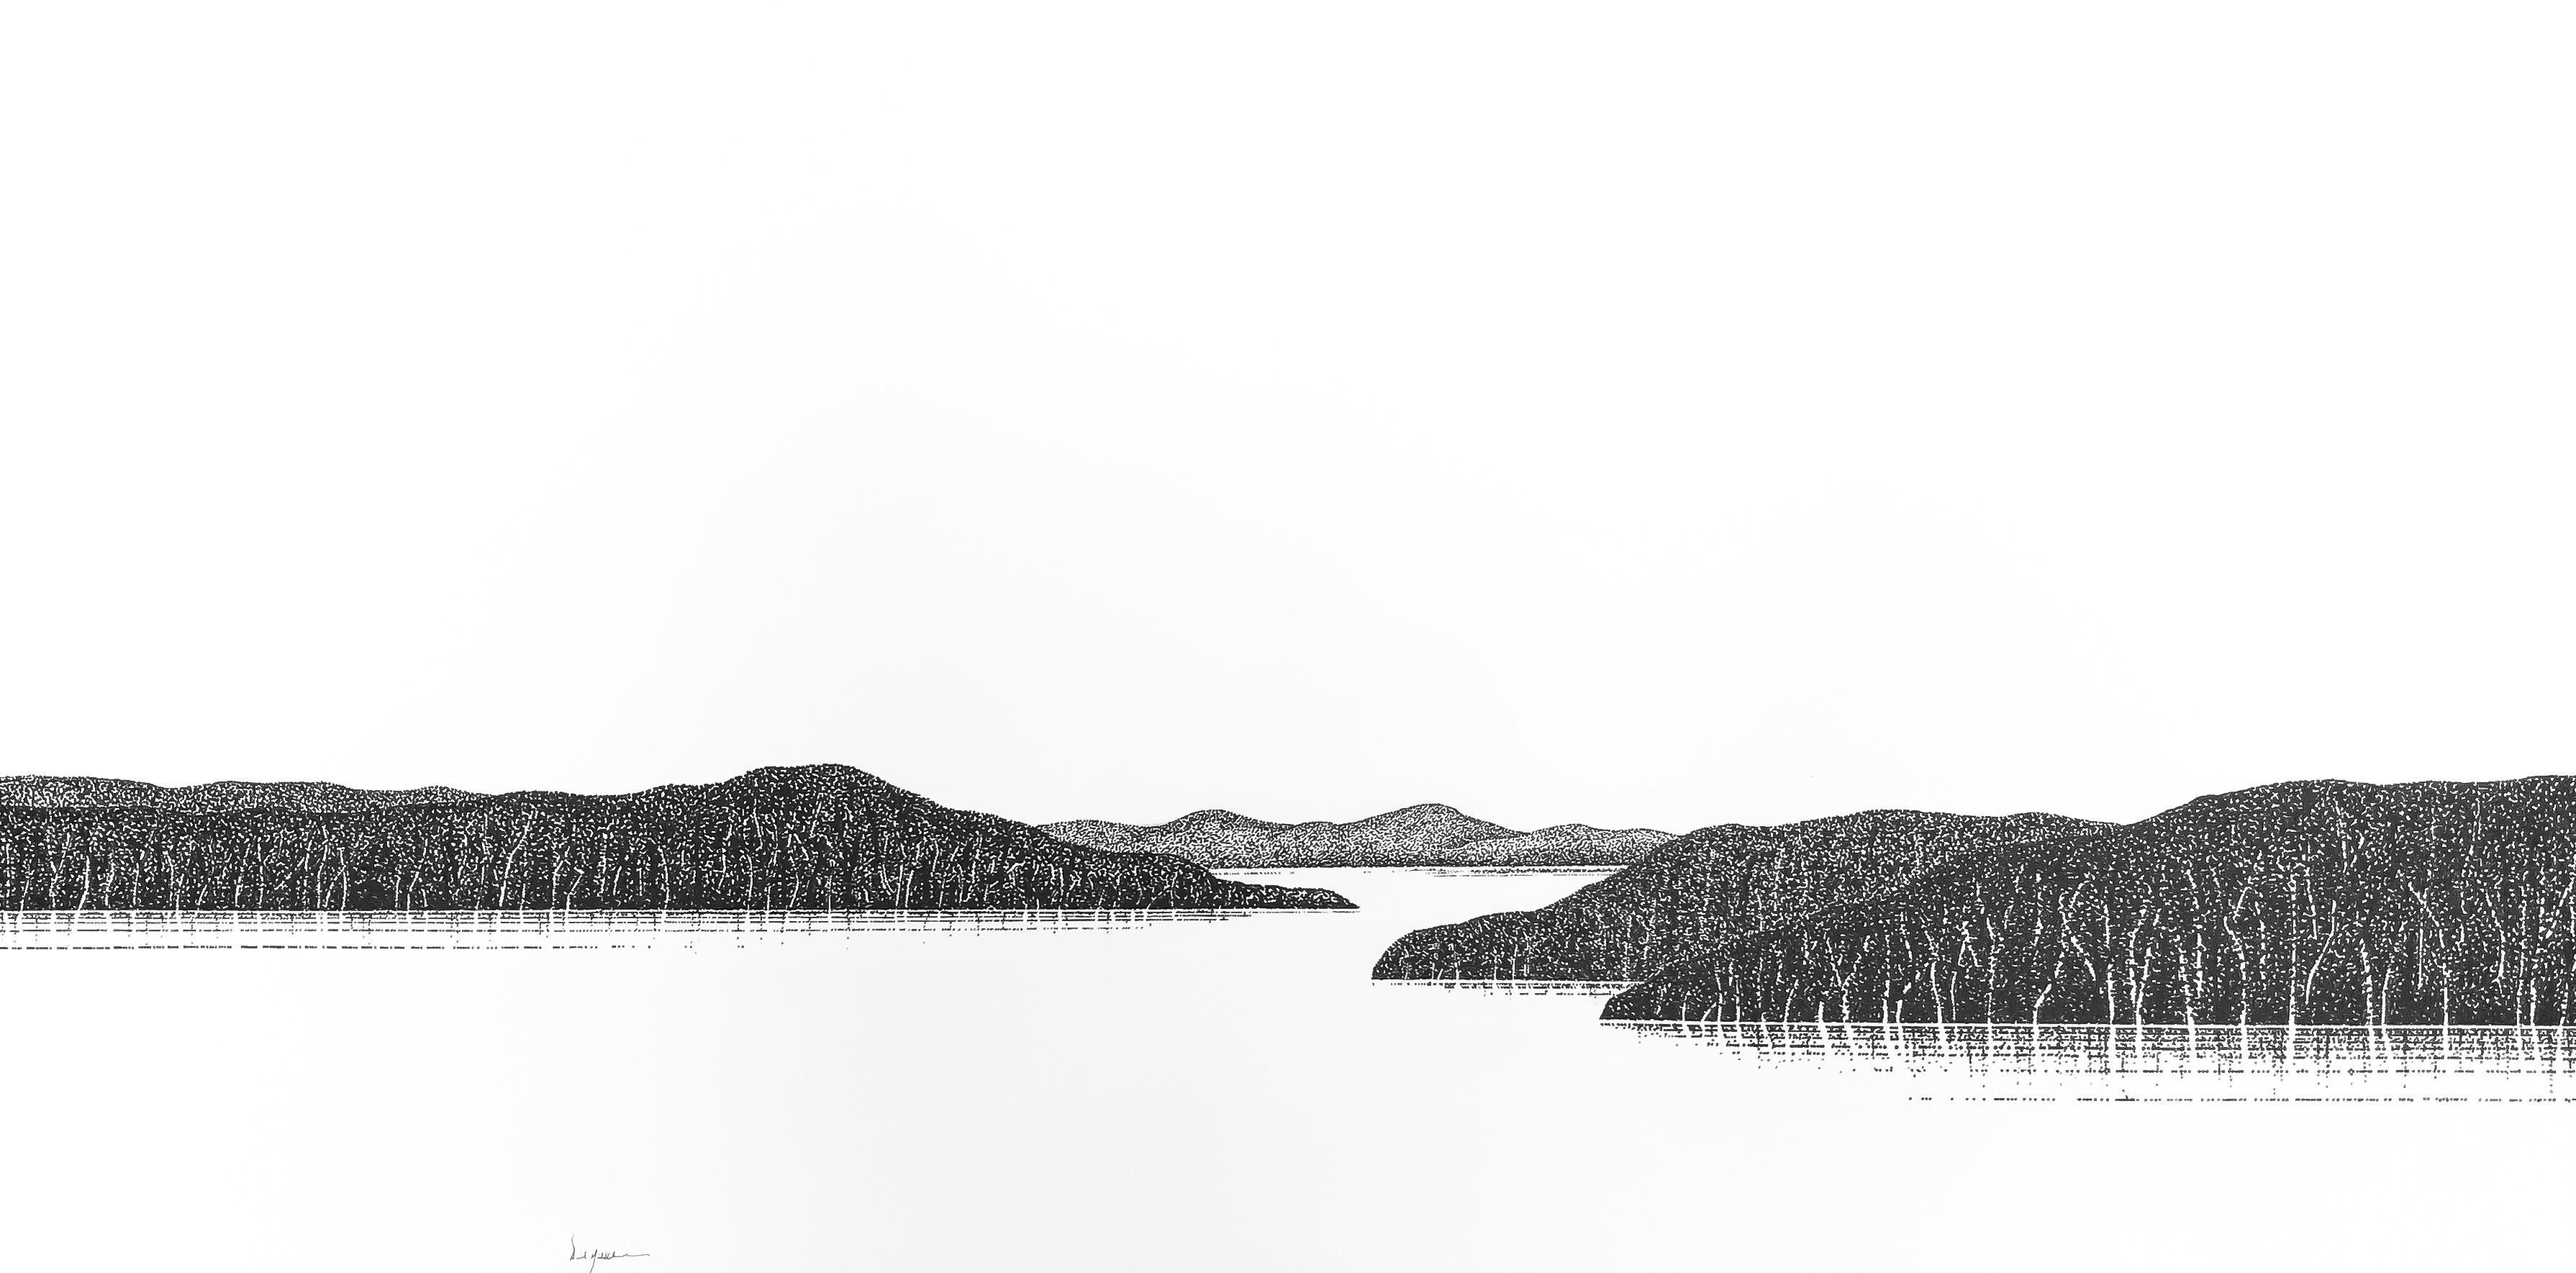 Art Atrium - David Middlebrook - The Dam Wall